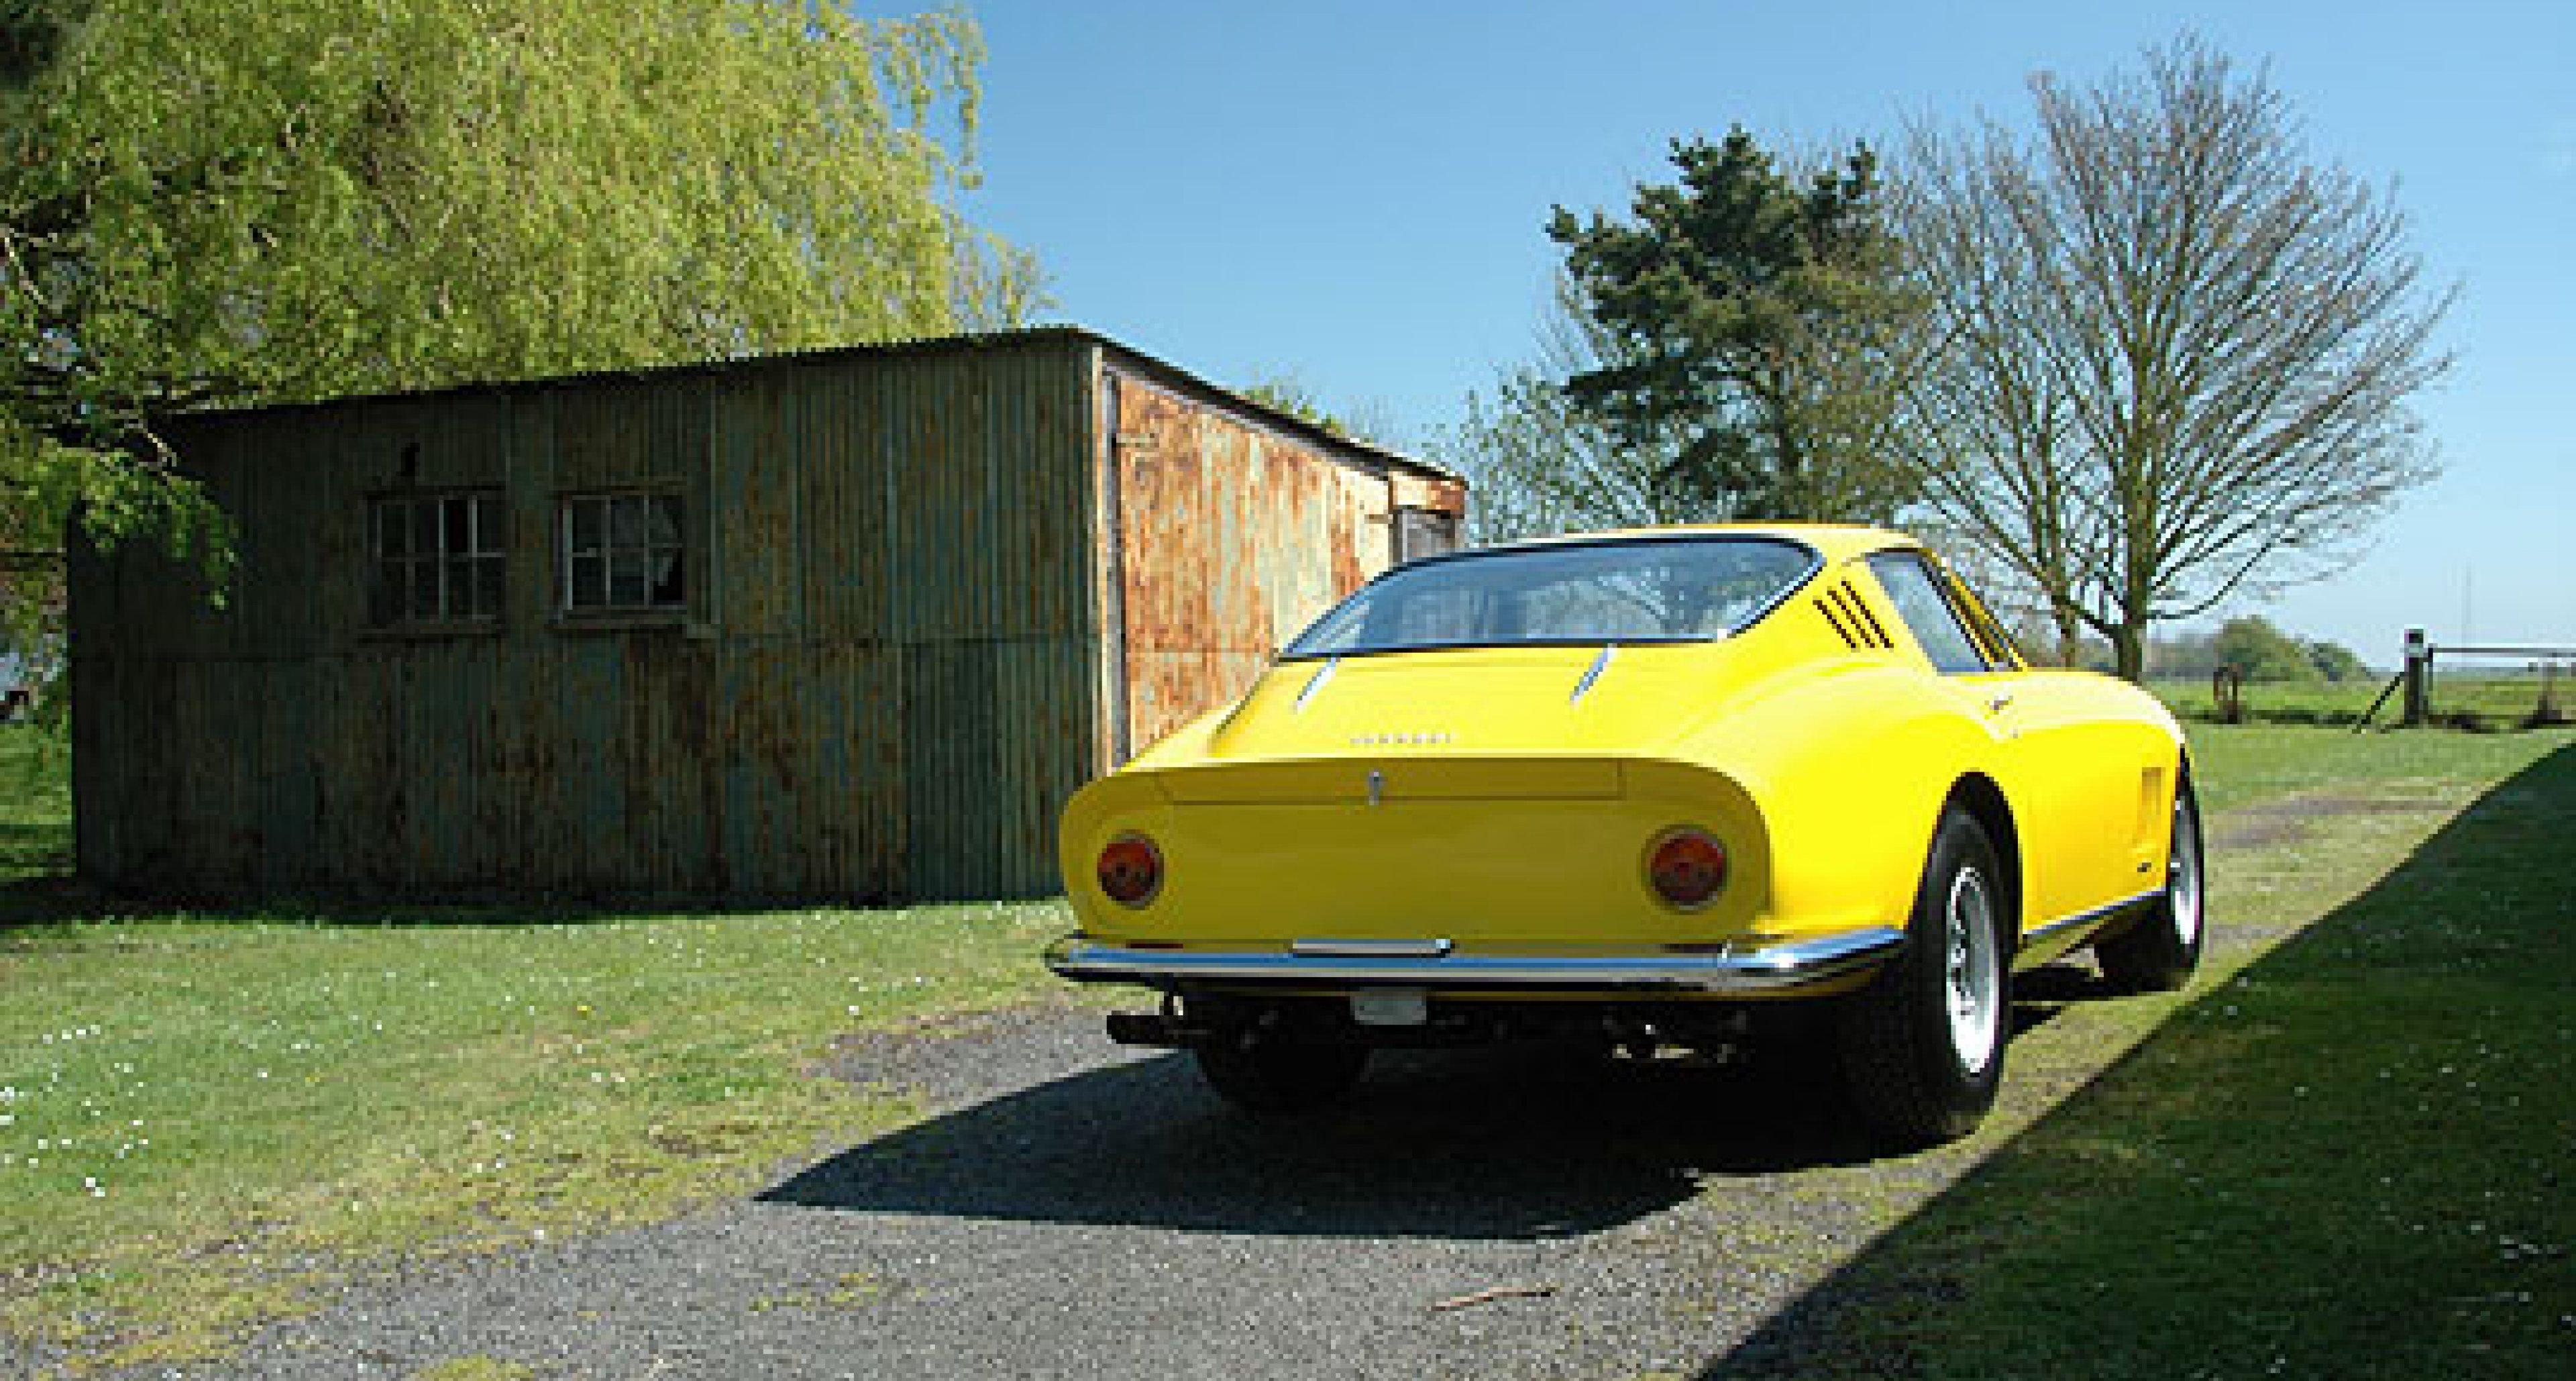 Ferrari Leggenda e Passione, May 2009: 1966 Ferrari 275 GTB Alloy